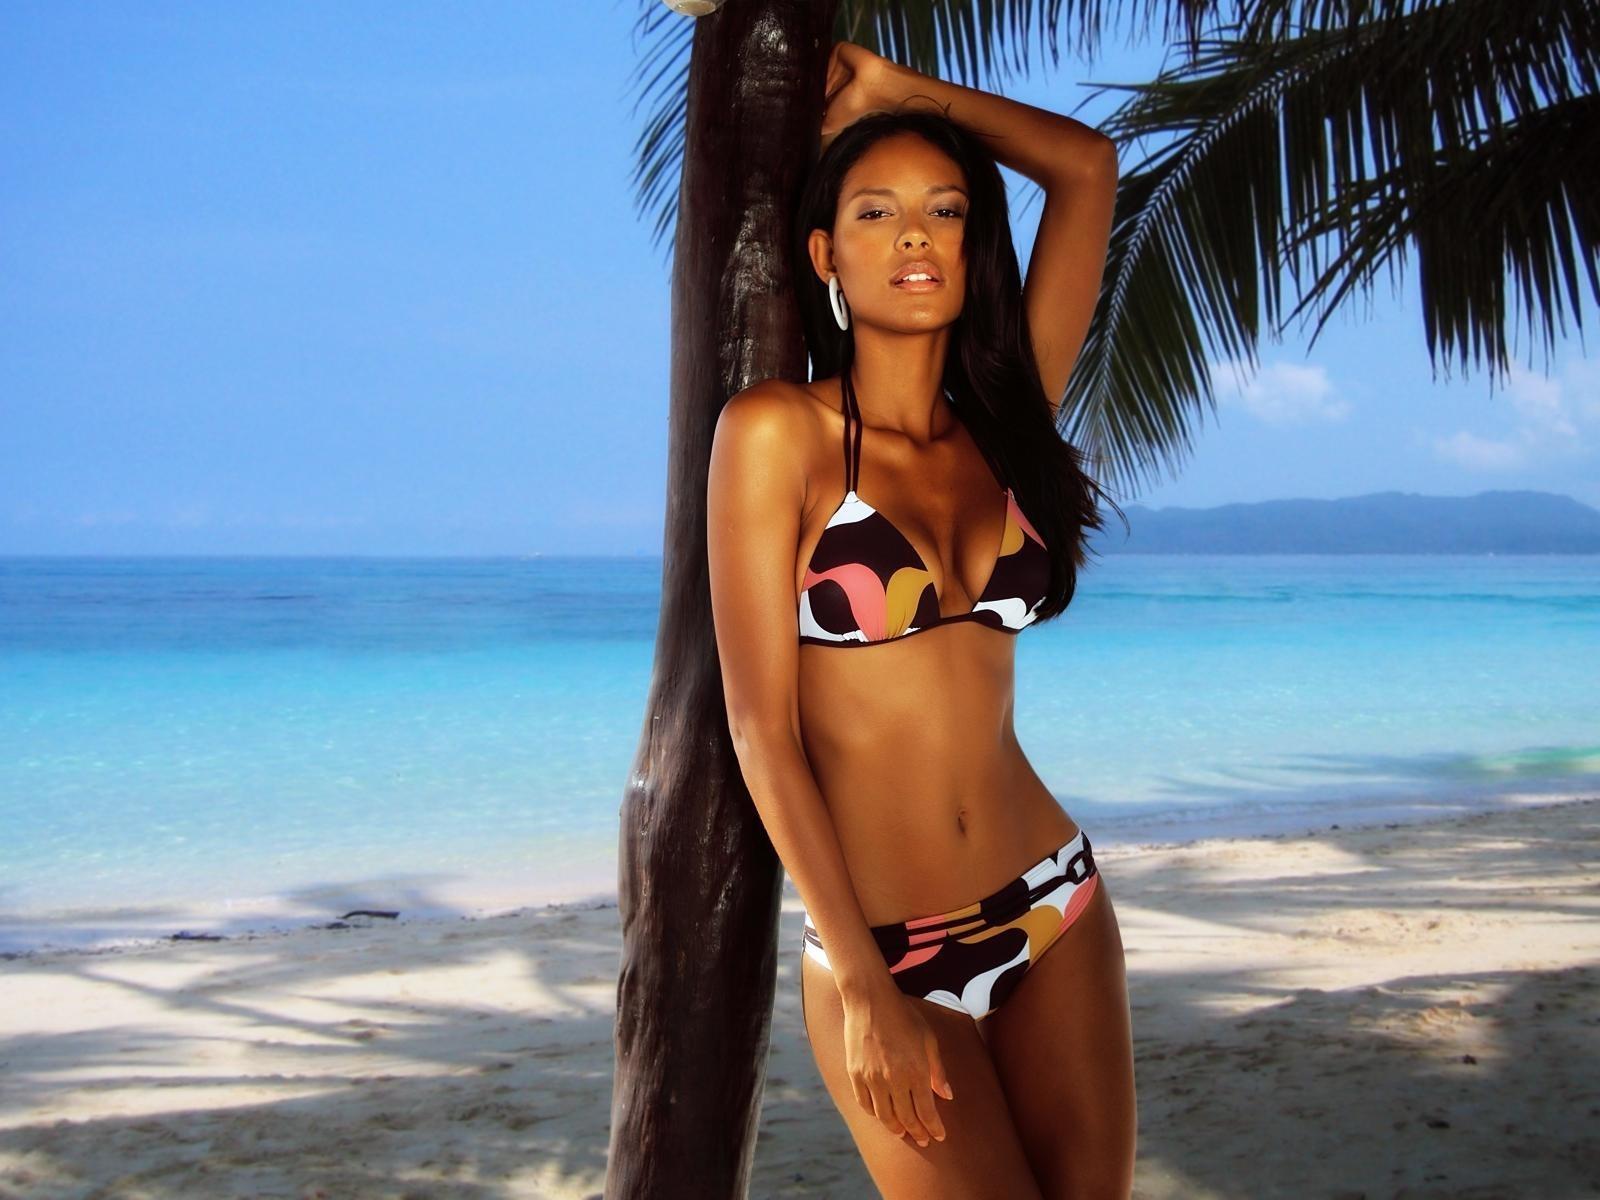 Bikini women wallpapers